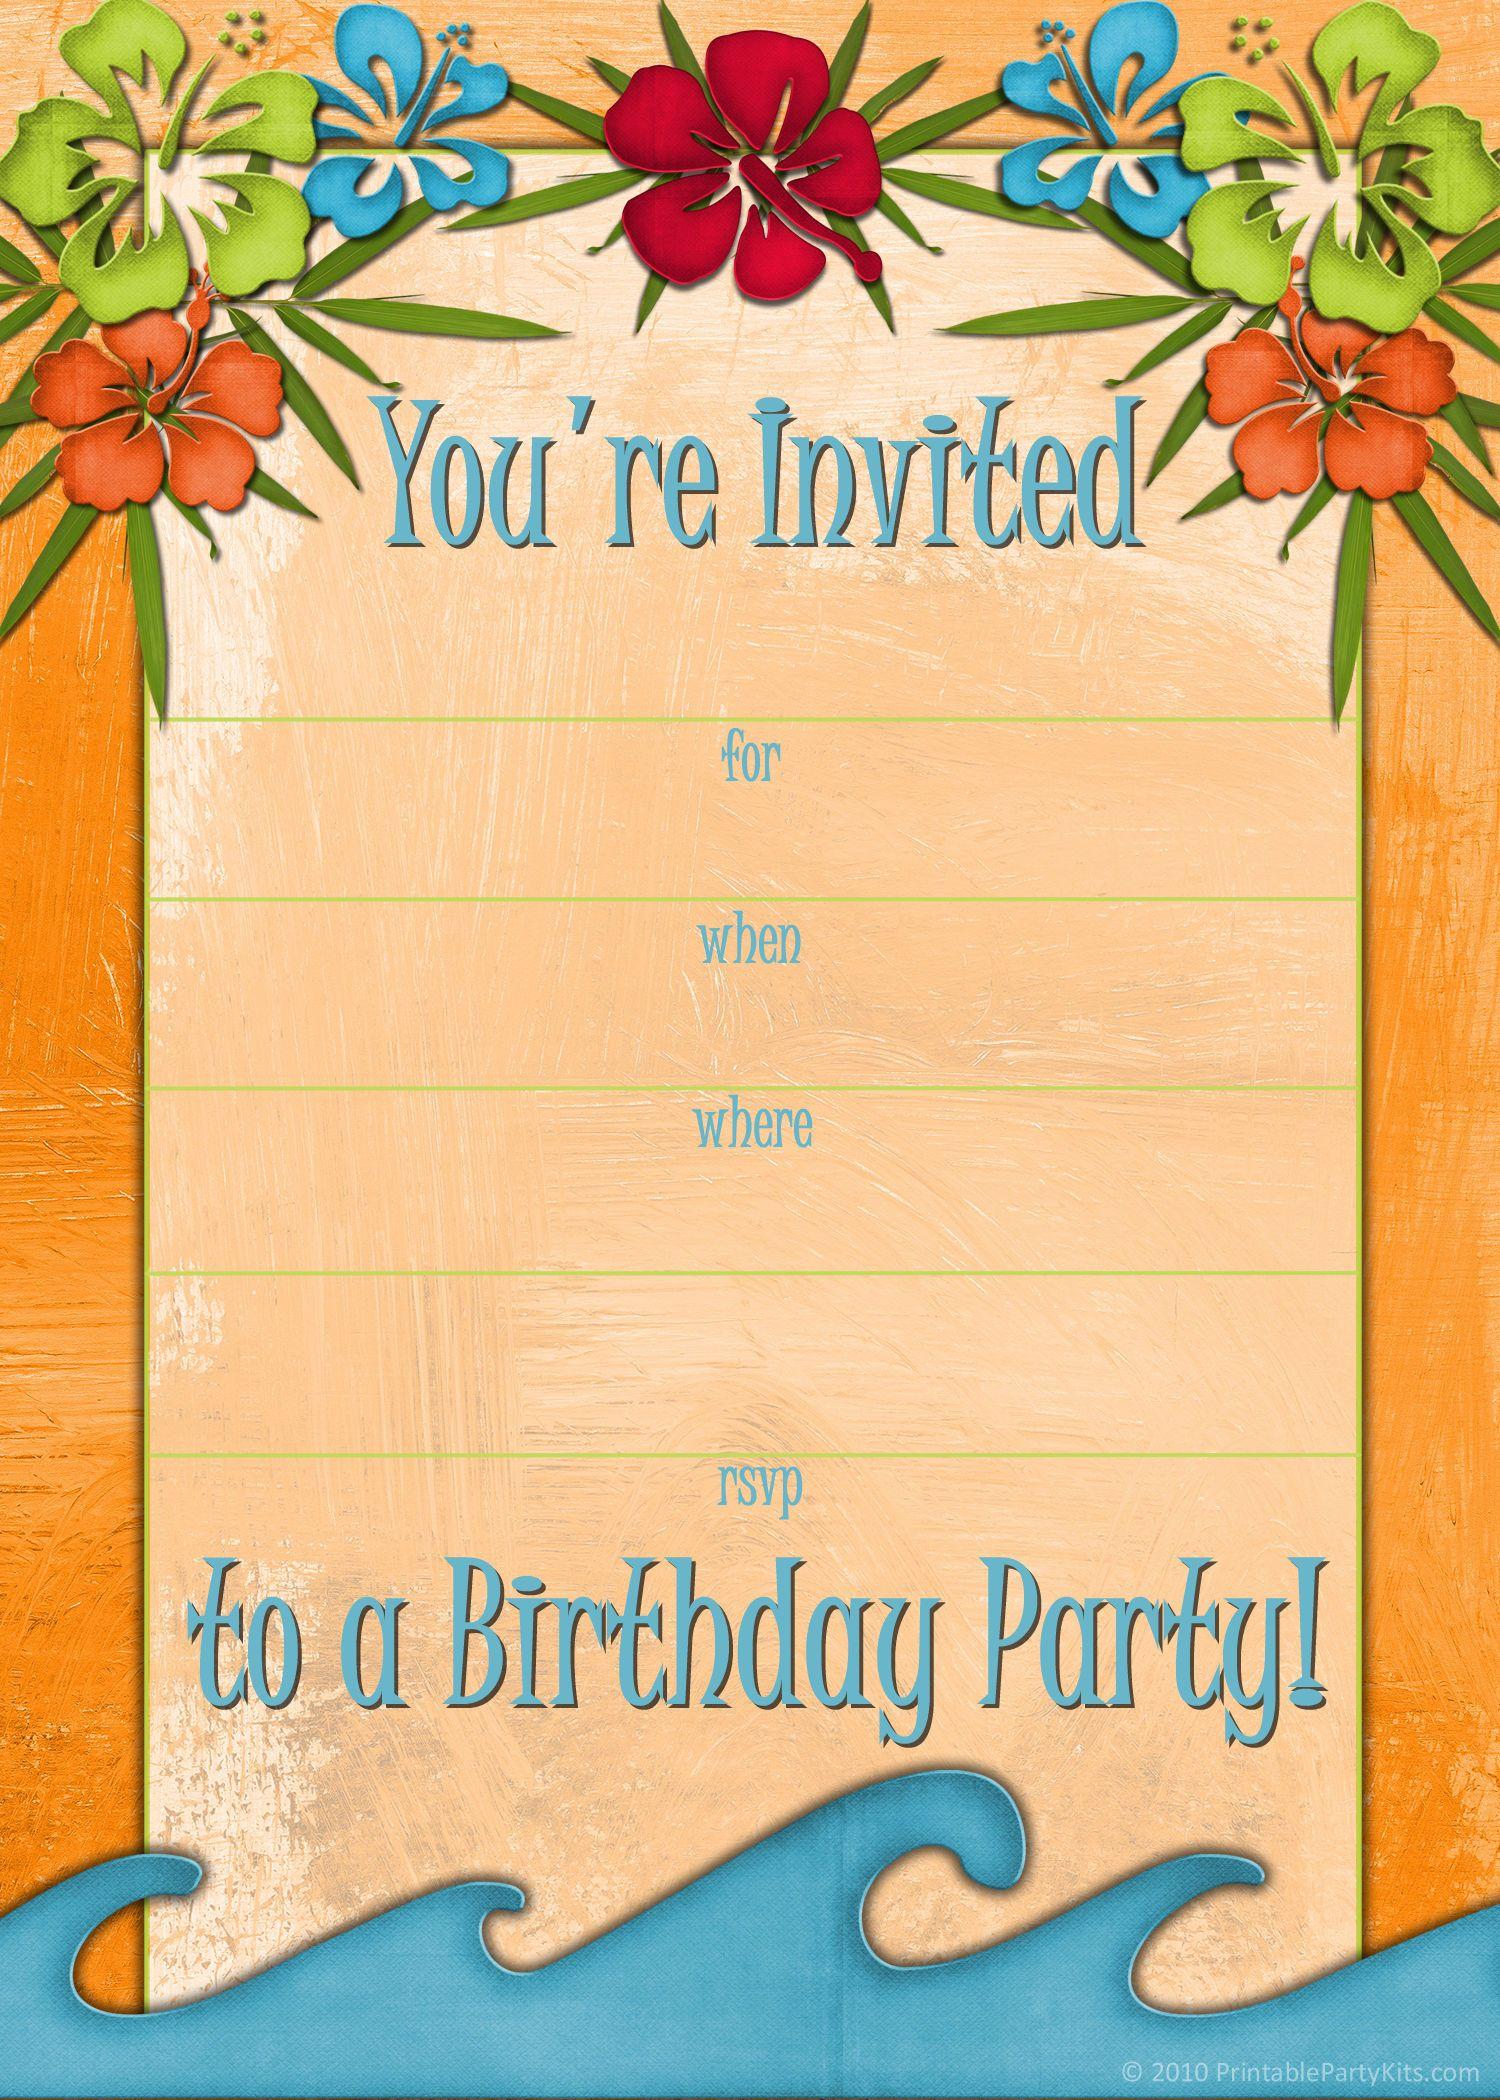 Free printable beach party luau and bbq invitations templates invitation templates luau and for Free printable luau invitations